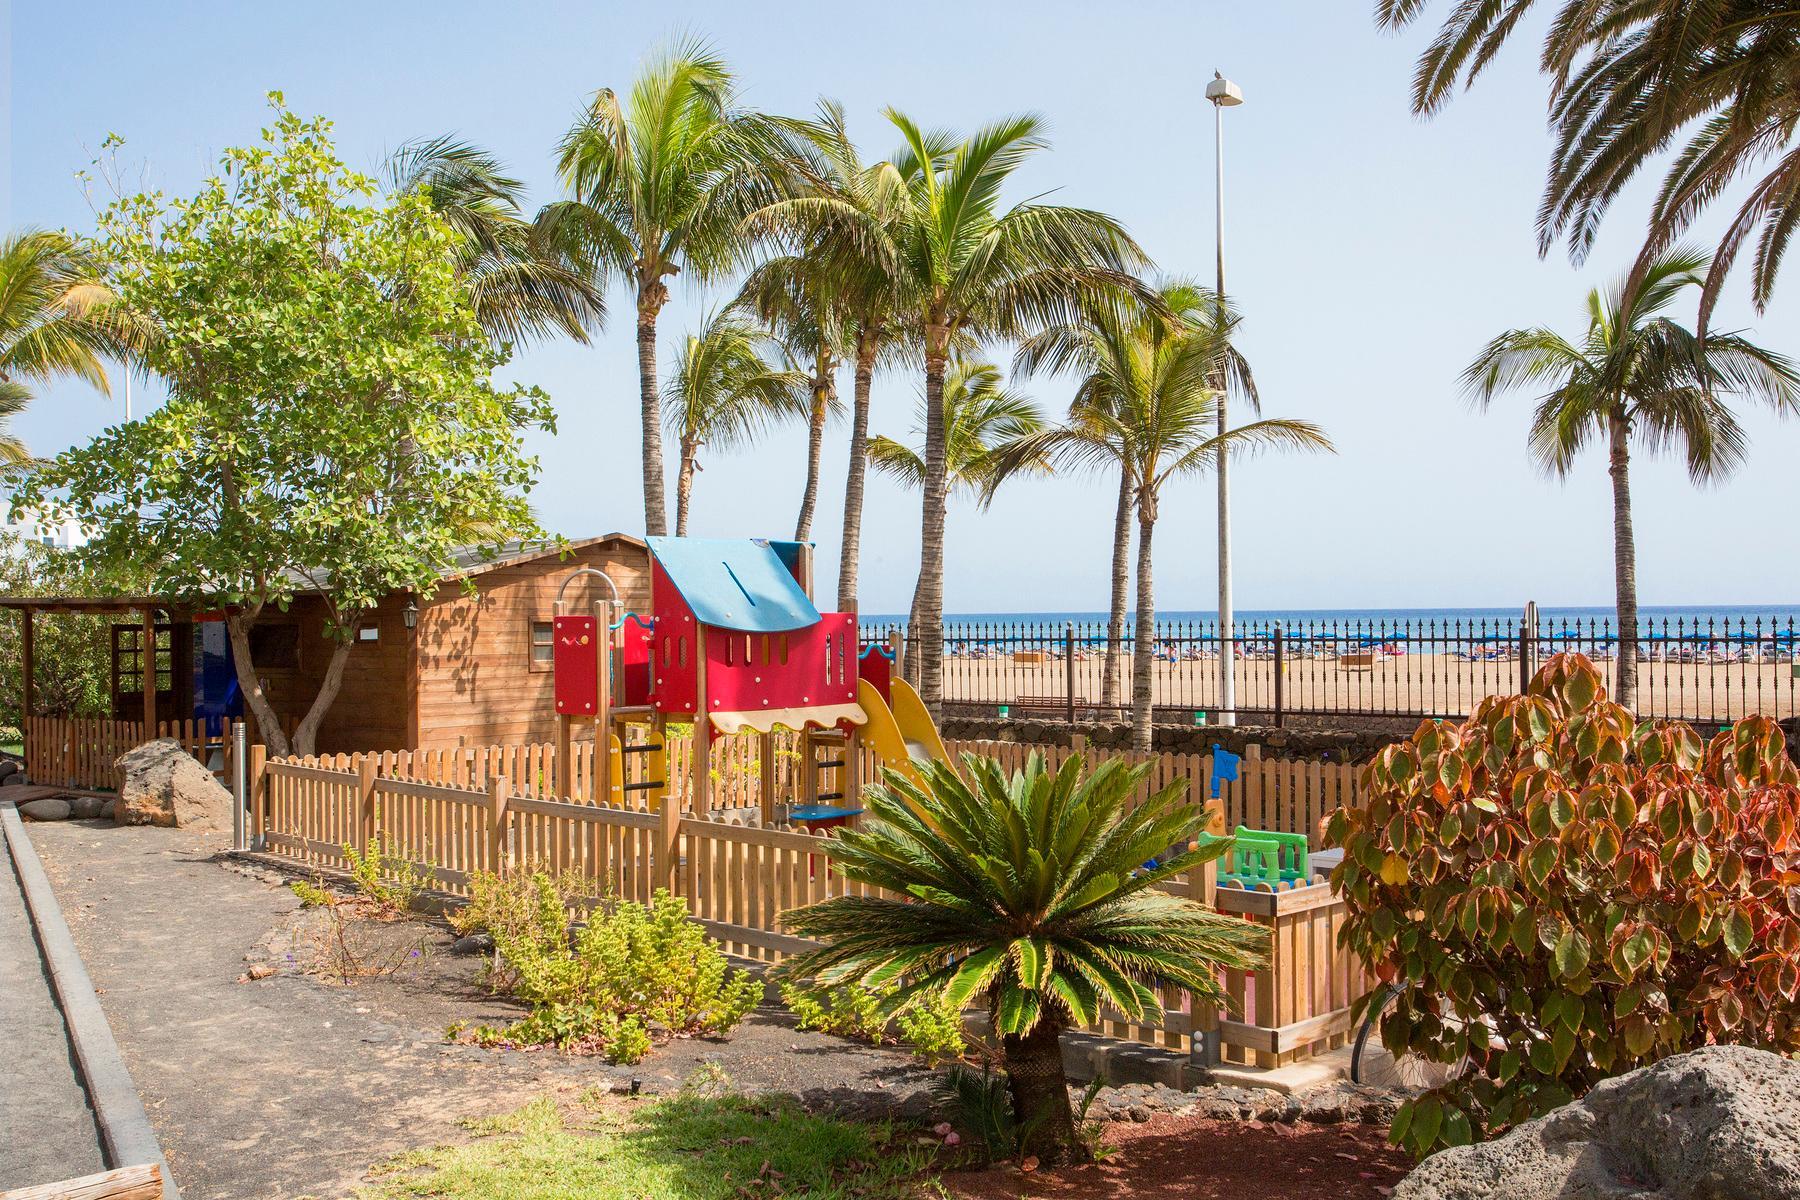 Hipotels la geria hotel in puerto del carmen lanzarote holidays from 324pp loveholidays - Cheap hotels lanzarote puerto del carmen ...